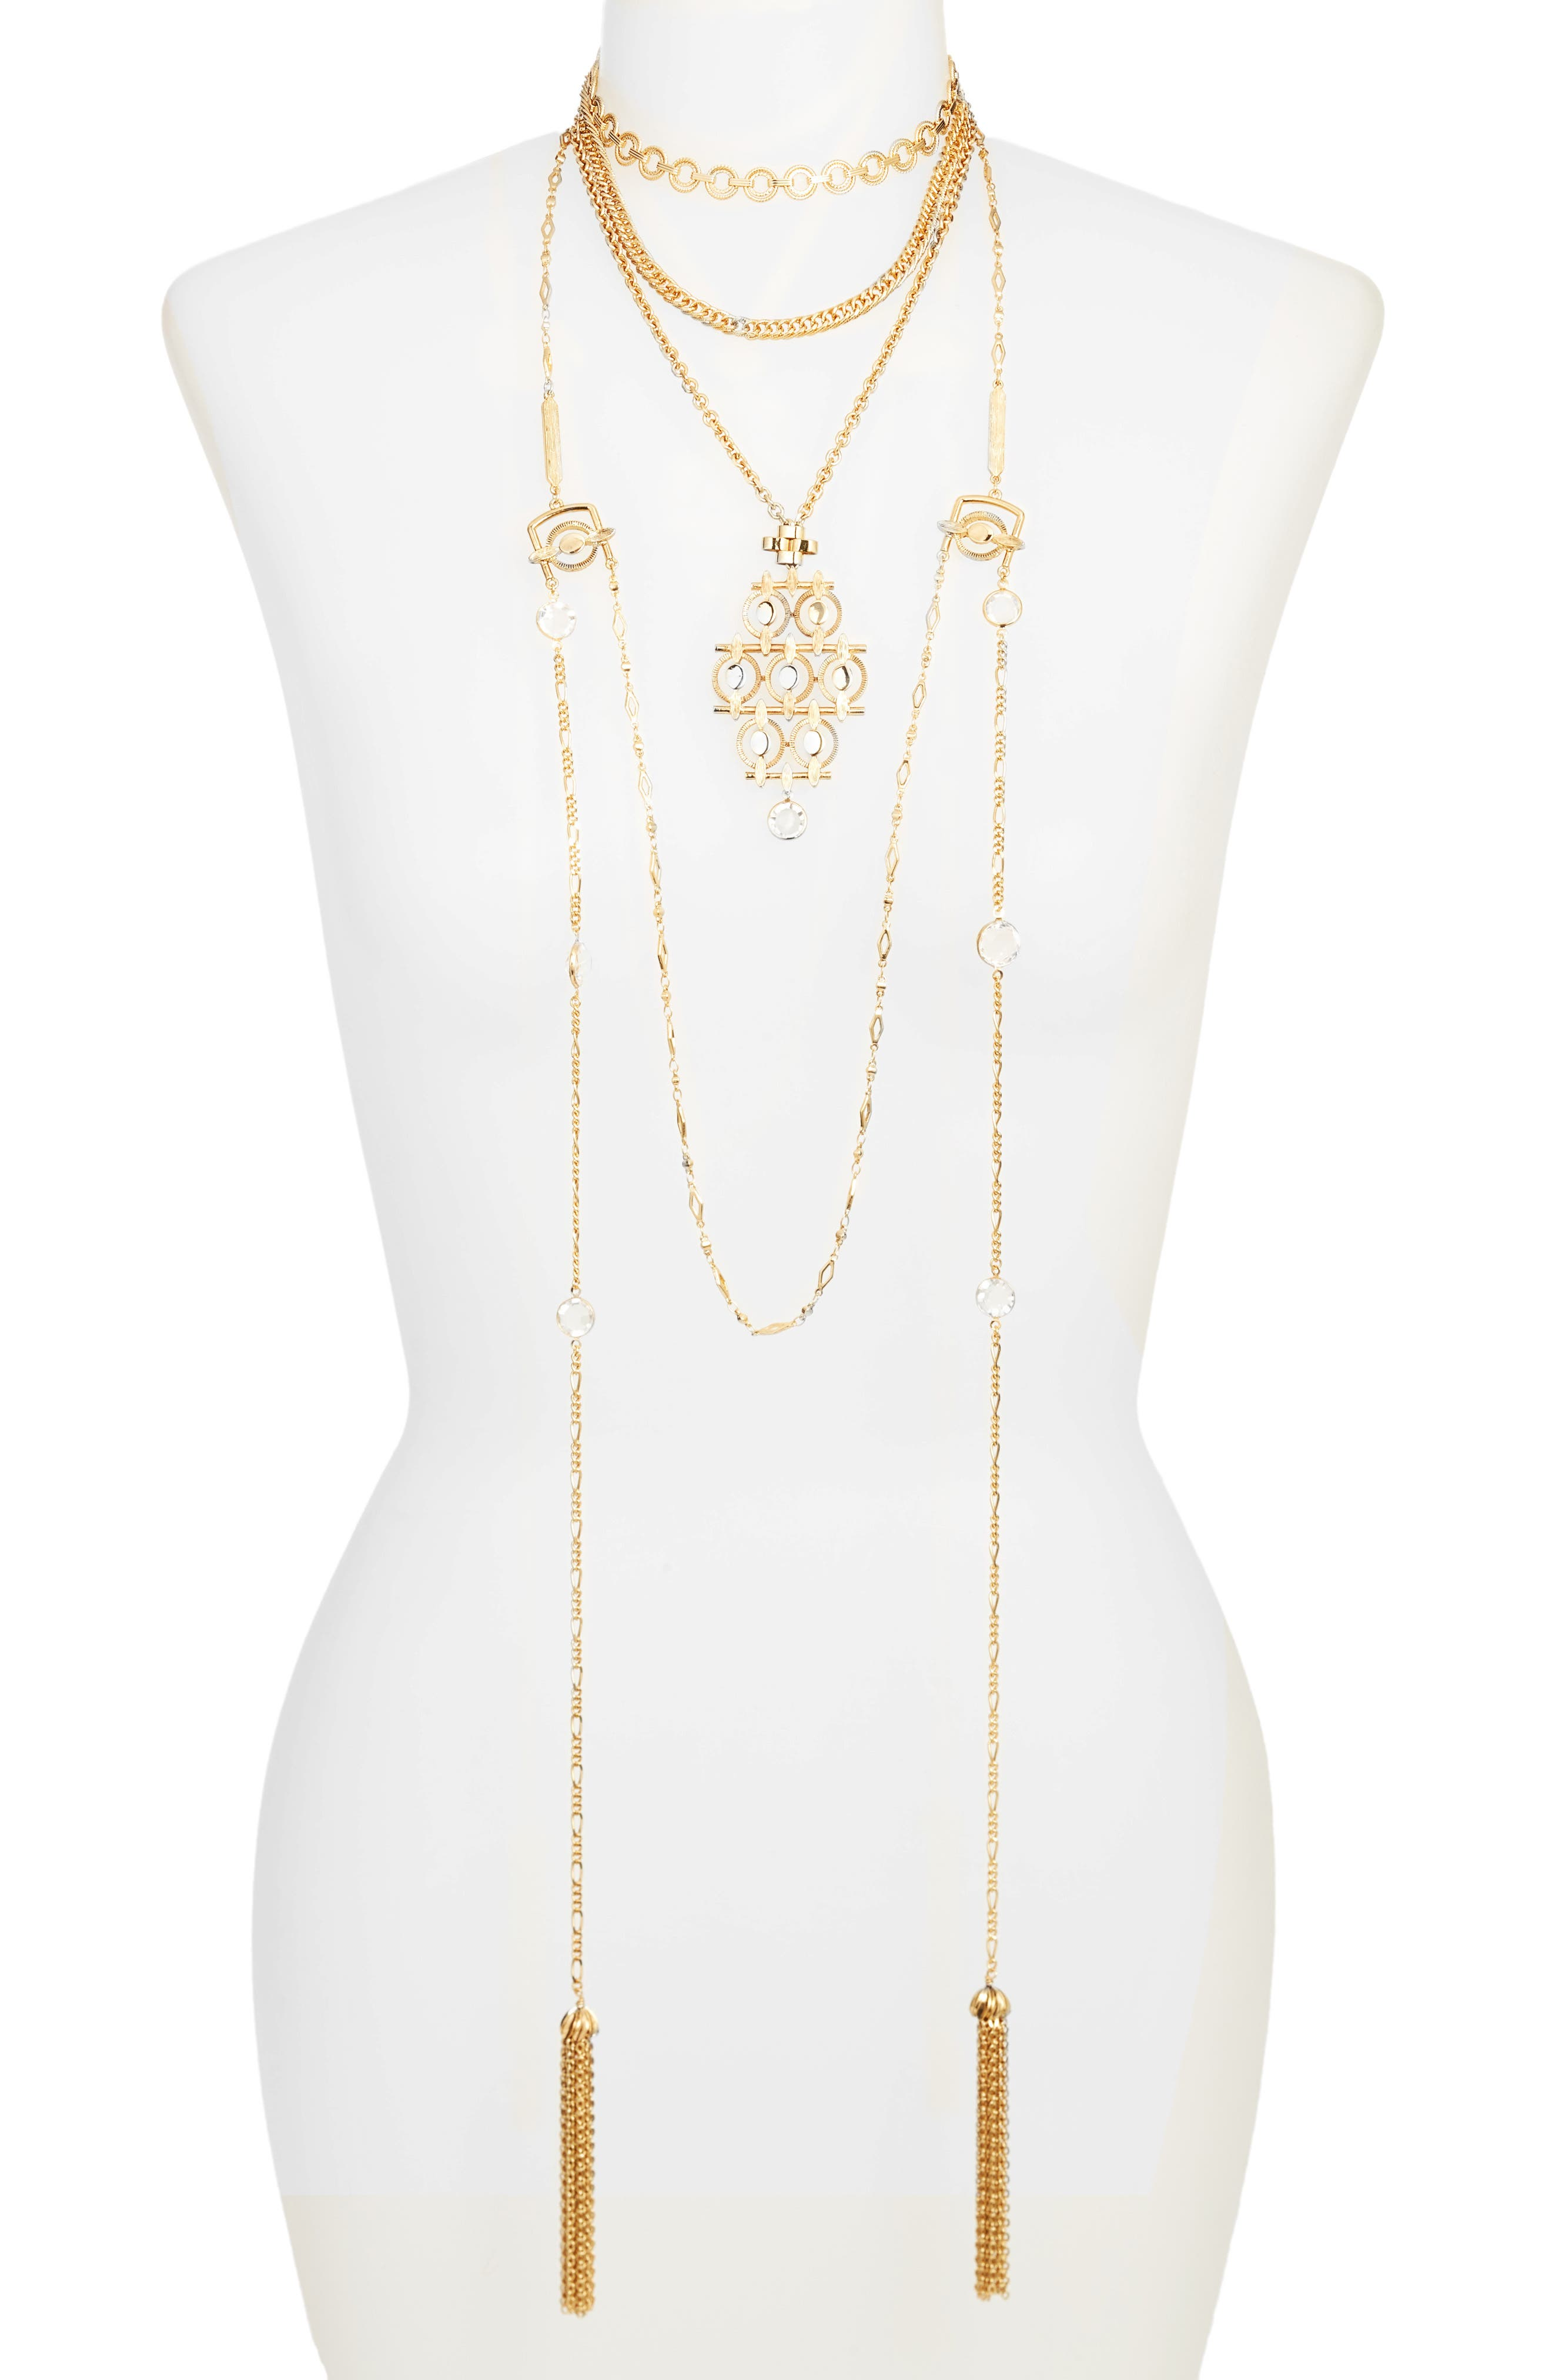 Alternate Image 1 Selected - Badgley Mischka Layered Tassel Necklace